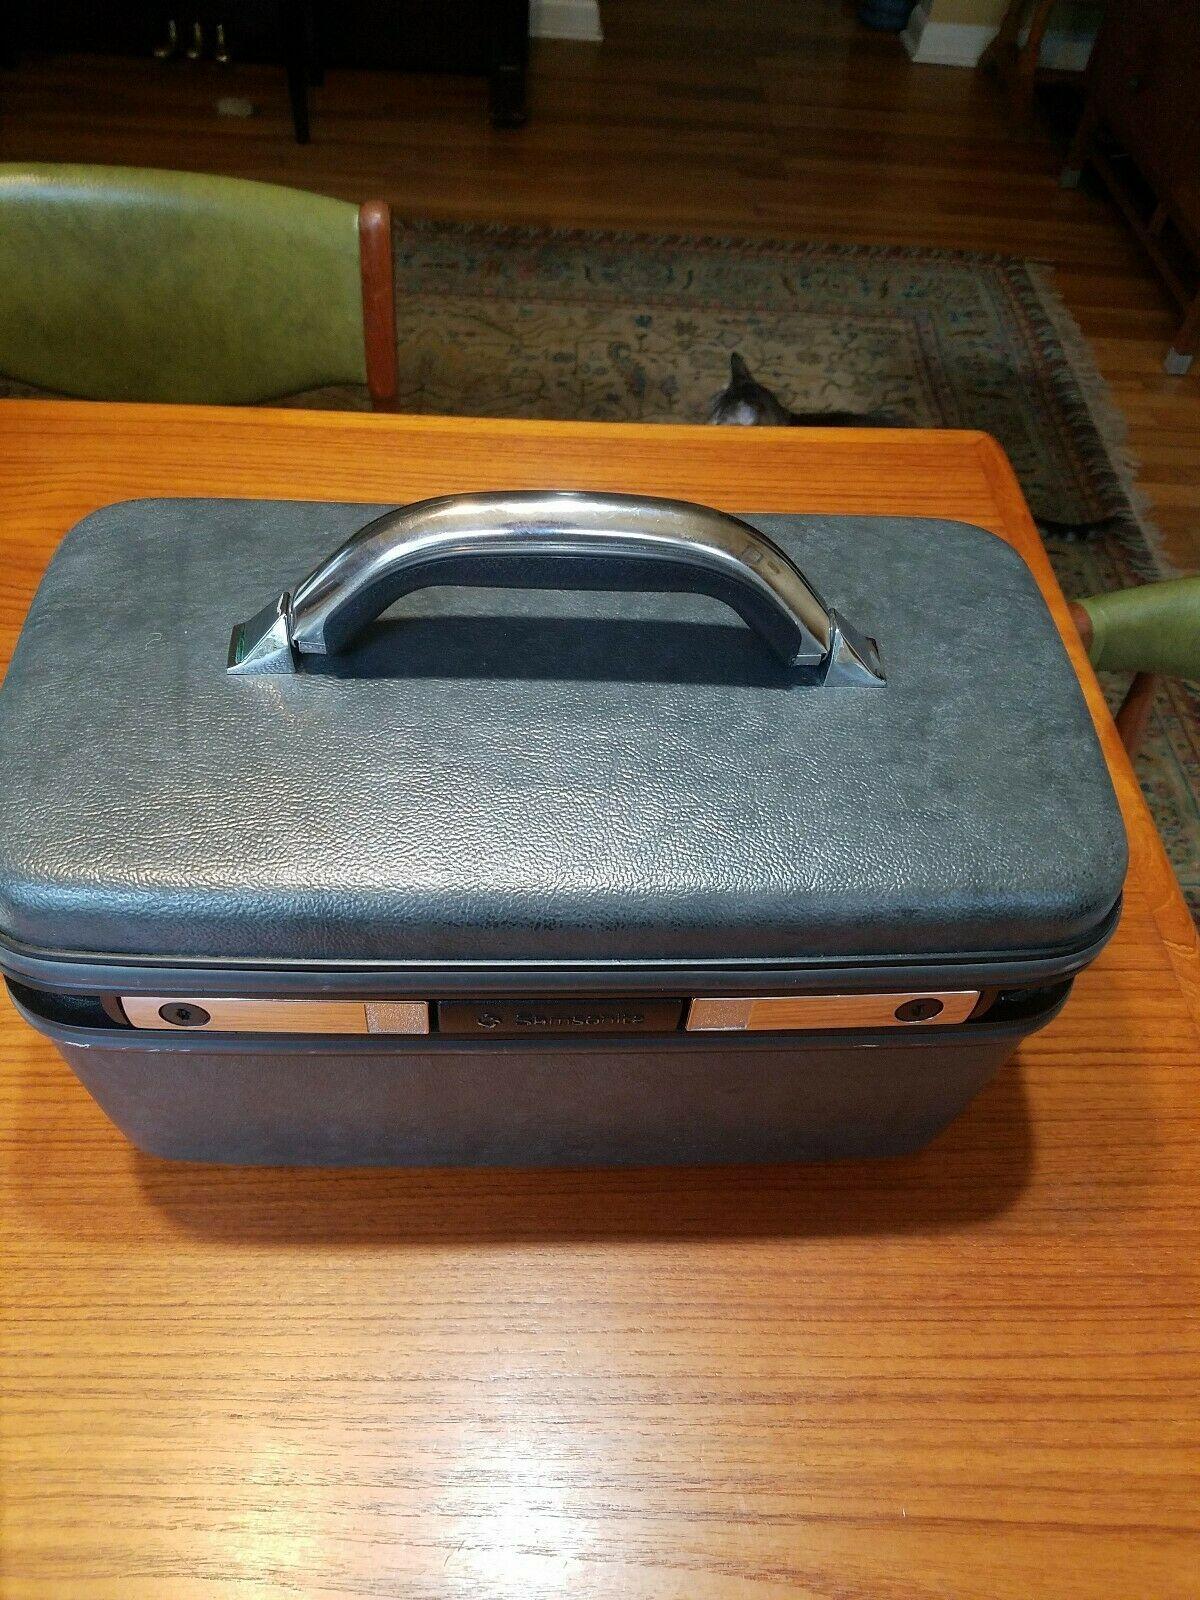 Vintage Samsonite Silhouette 4 Suitcase Luggage Train Make Up Case Black  no key